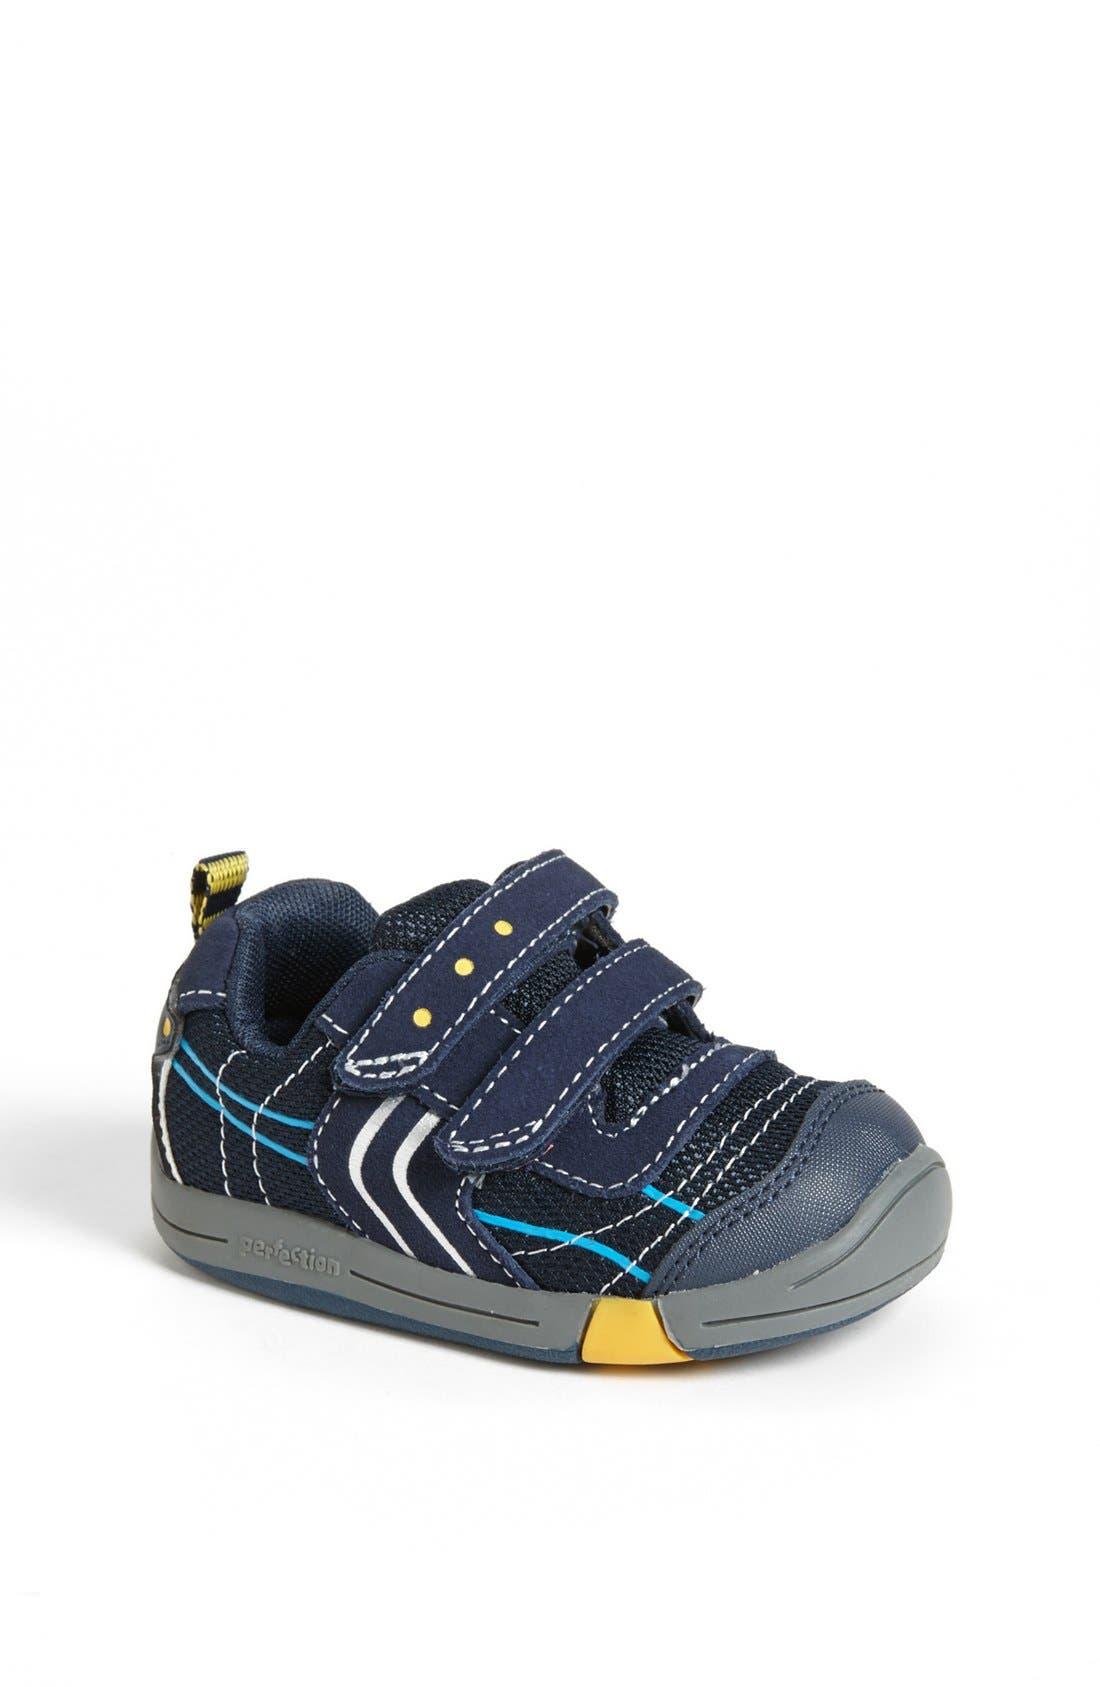 Alternate Image 1 Selected - Jumping Jacks 'Lazer' Sneaker (Baby, Walker & Toddler)